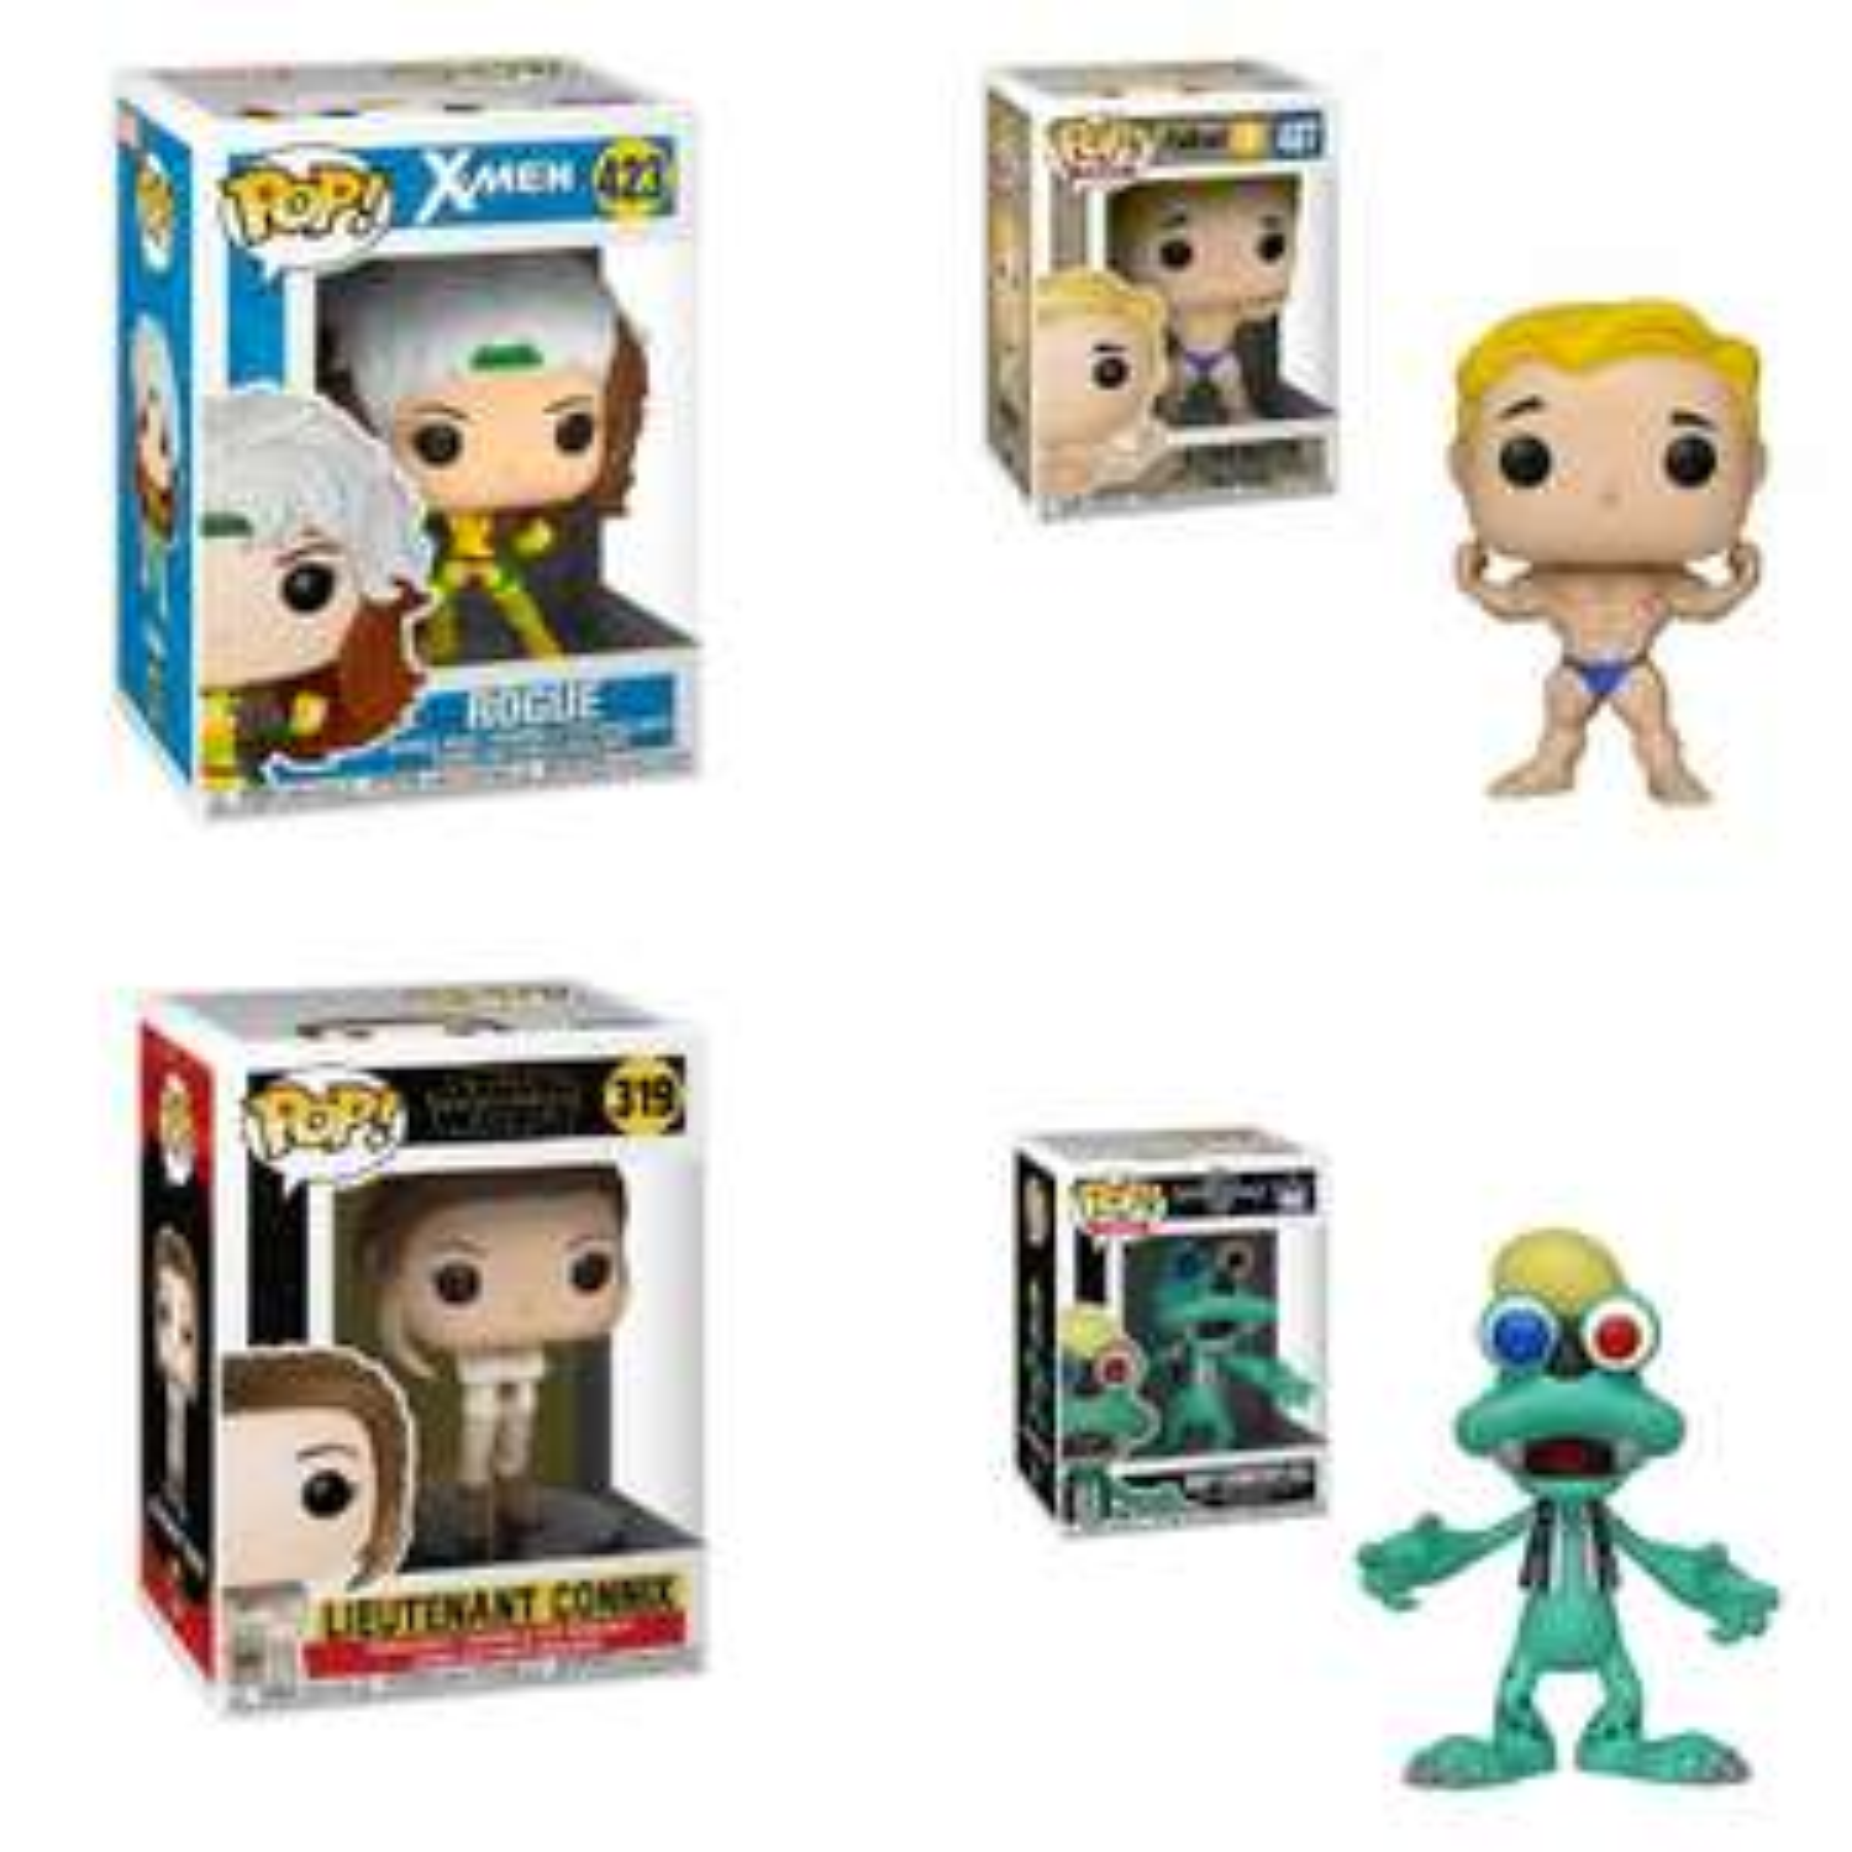 Sélection de figurines Funko POP en promotion - Ex : Funko Pop! X-Men, Star Wars, Kingdom Hearts ou Fallout